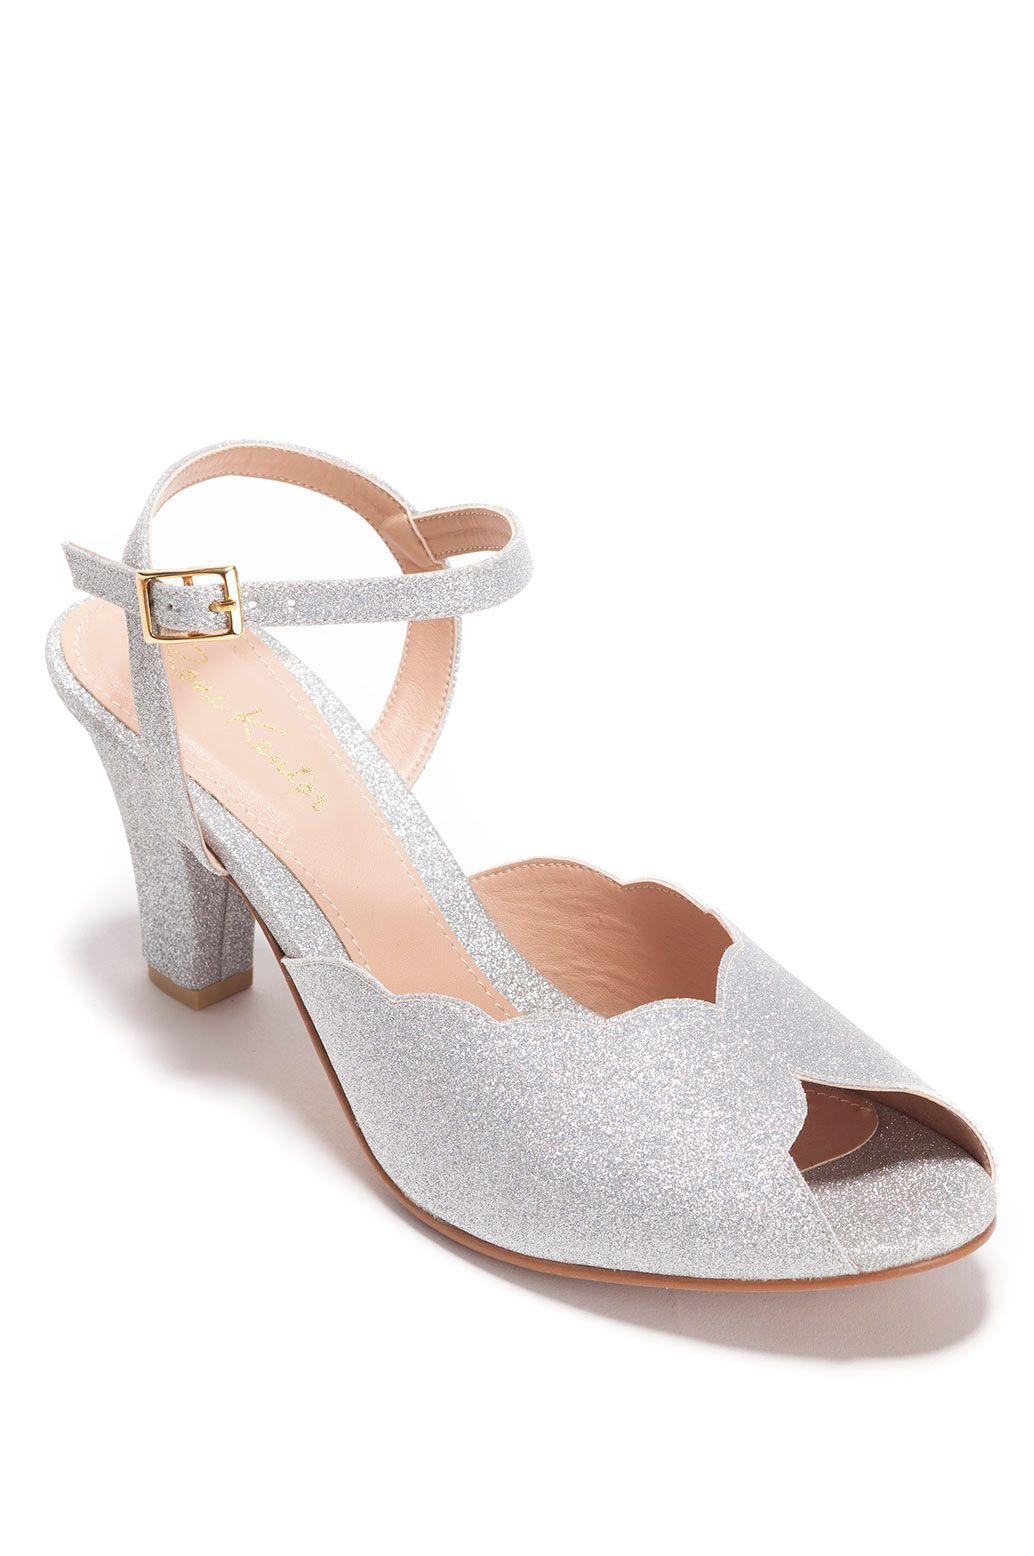 7d3e05fb2de16 Adina Vegan Bridal Shoes, Sparkling Silver High Heel Wedding Sandal ...